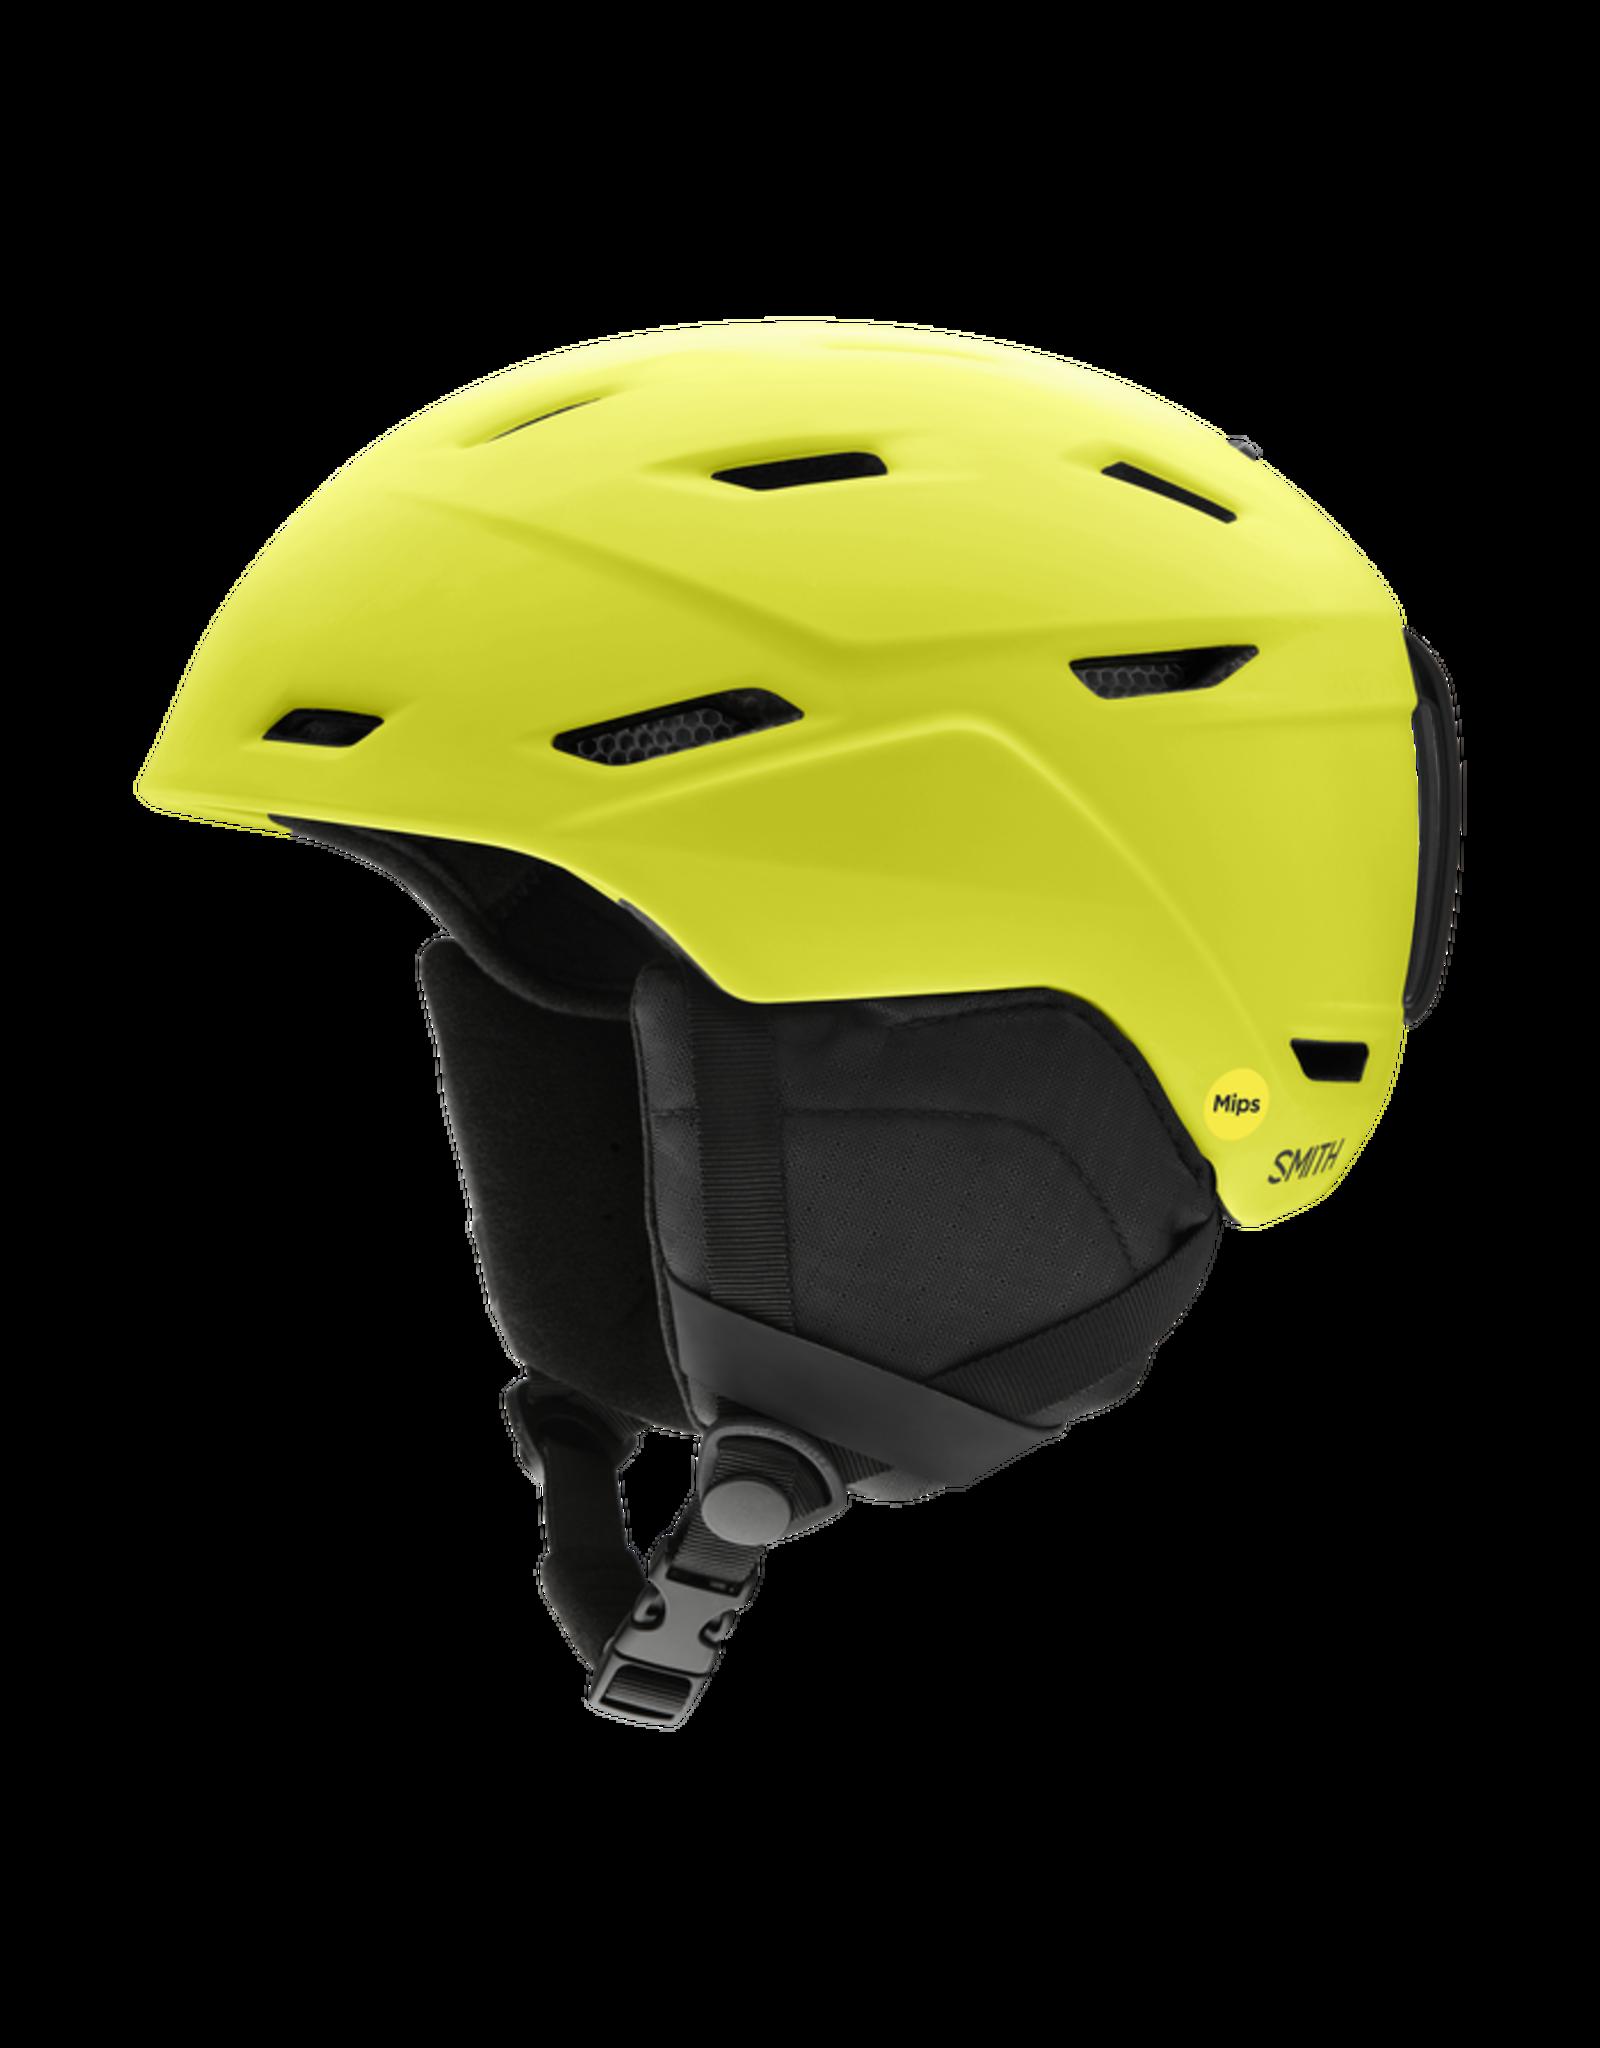 smith optics Smith Mission mips helmet - Matte Neon Yellow - Large 59-63cm